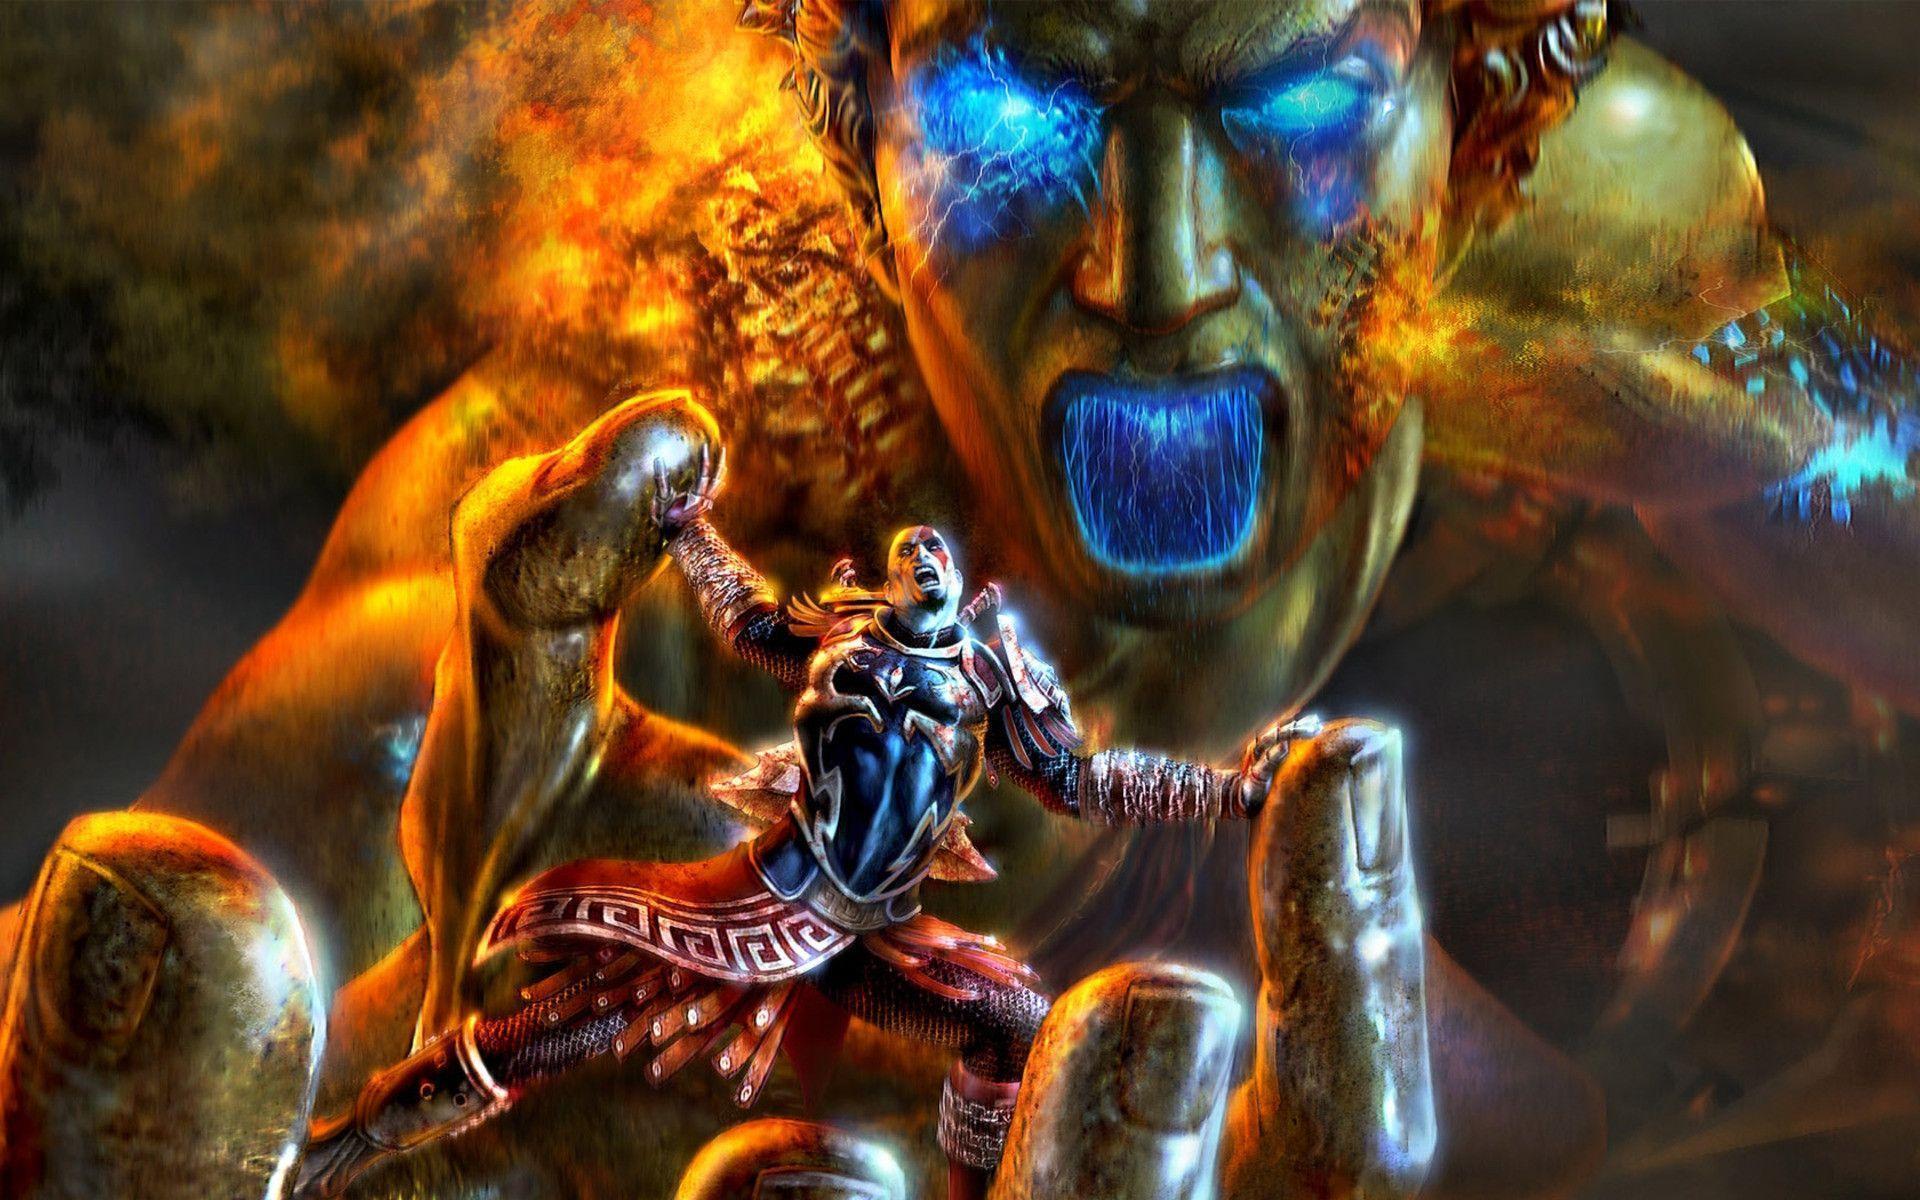 God Of War 2 HD Wallpapers - HD Wallpapers Inn